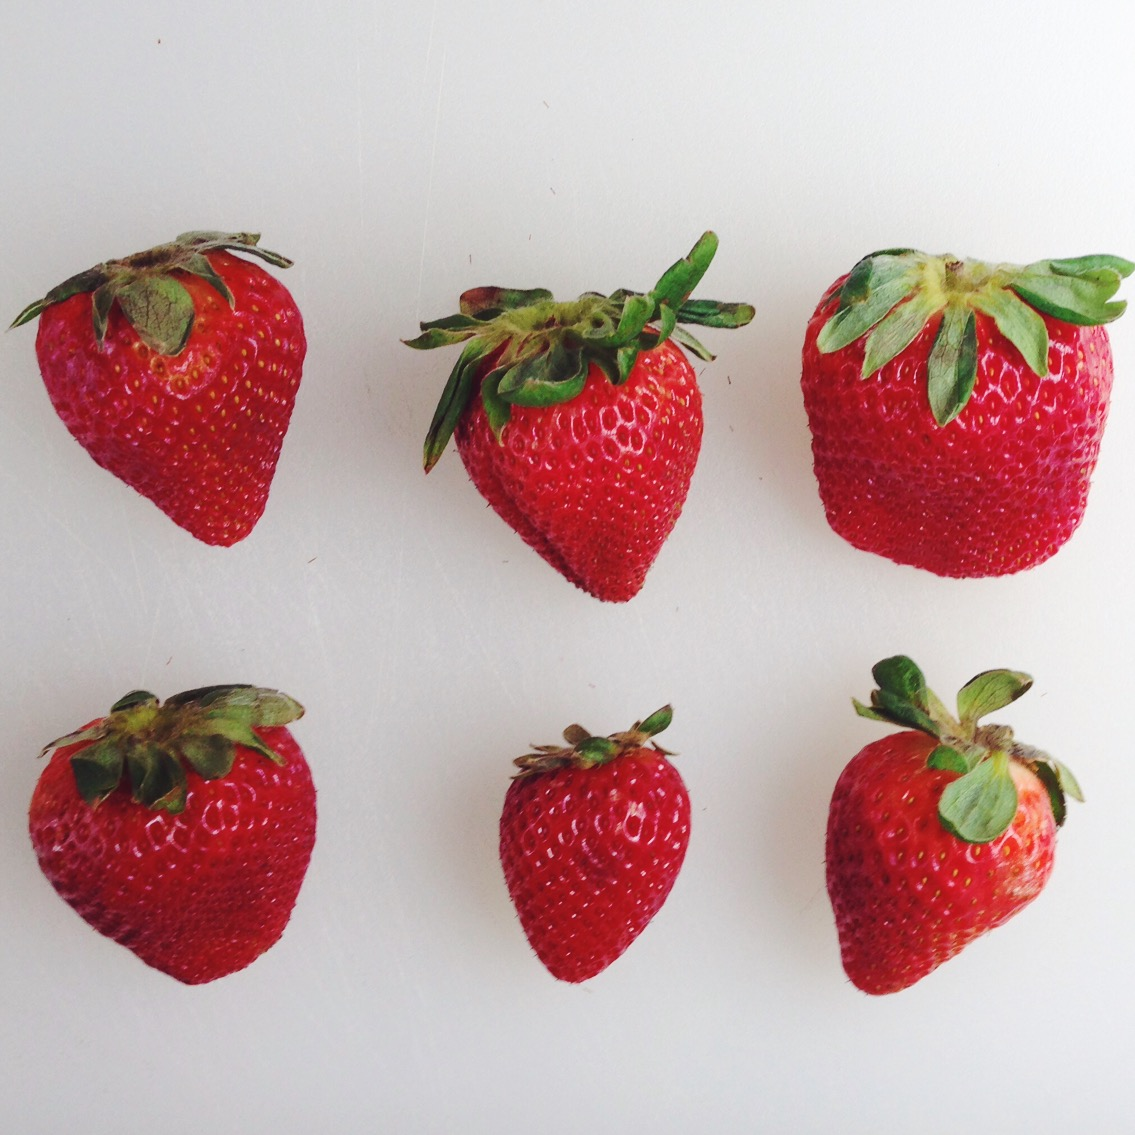 Yummy Strawberries!   The Corduroy Fox